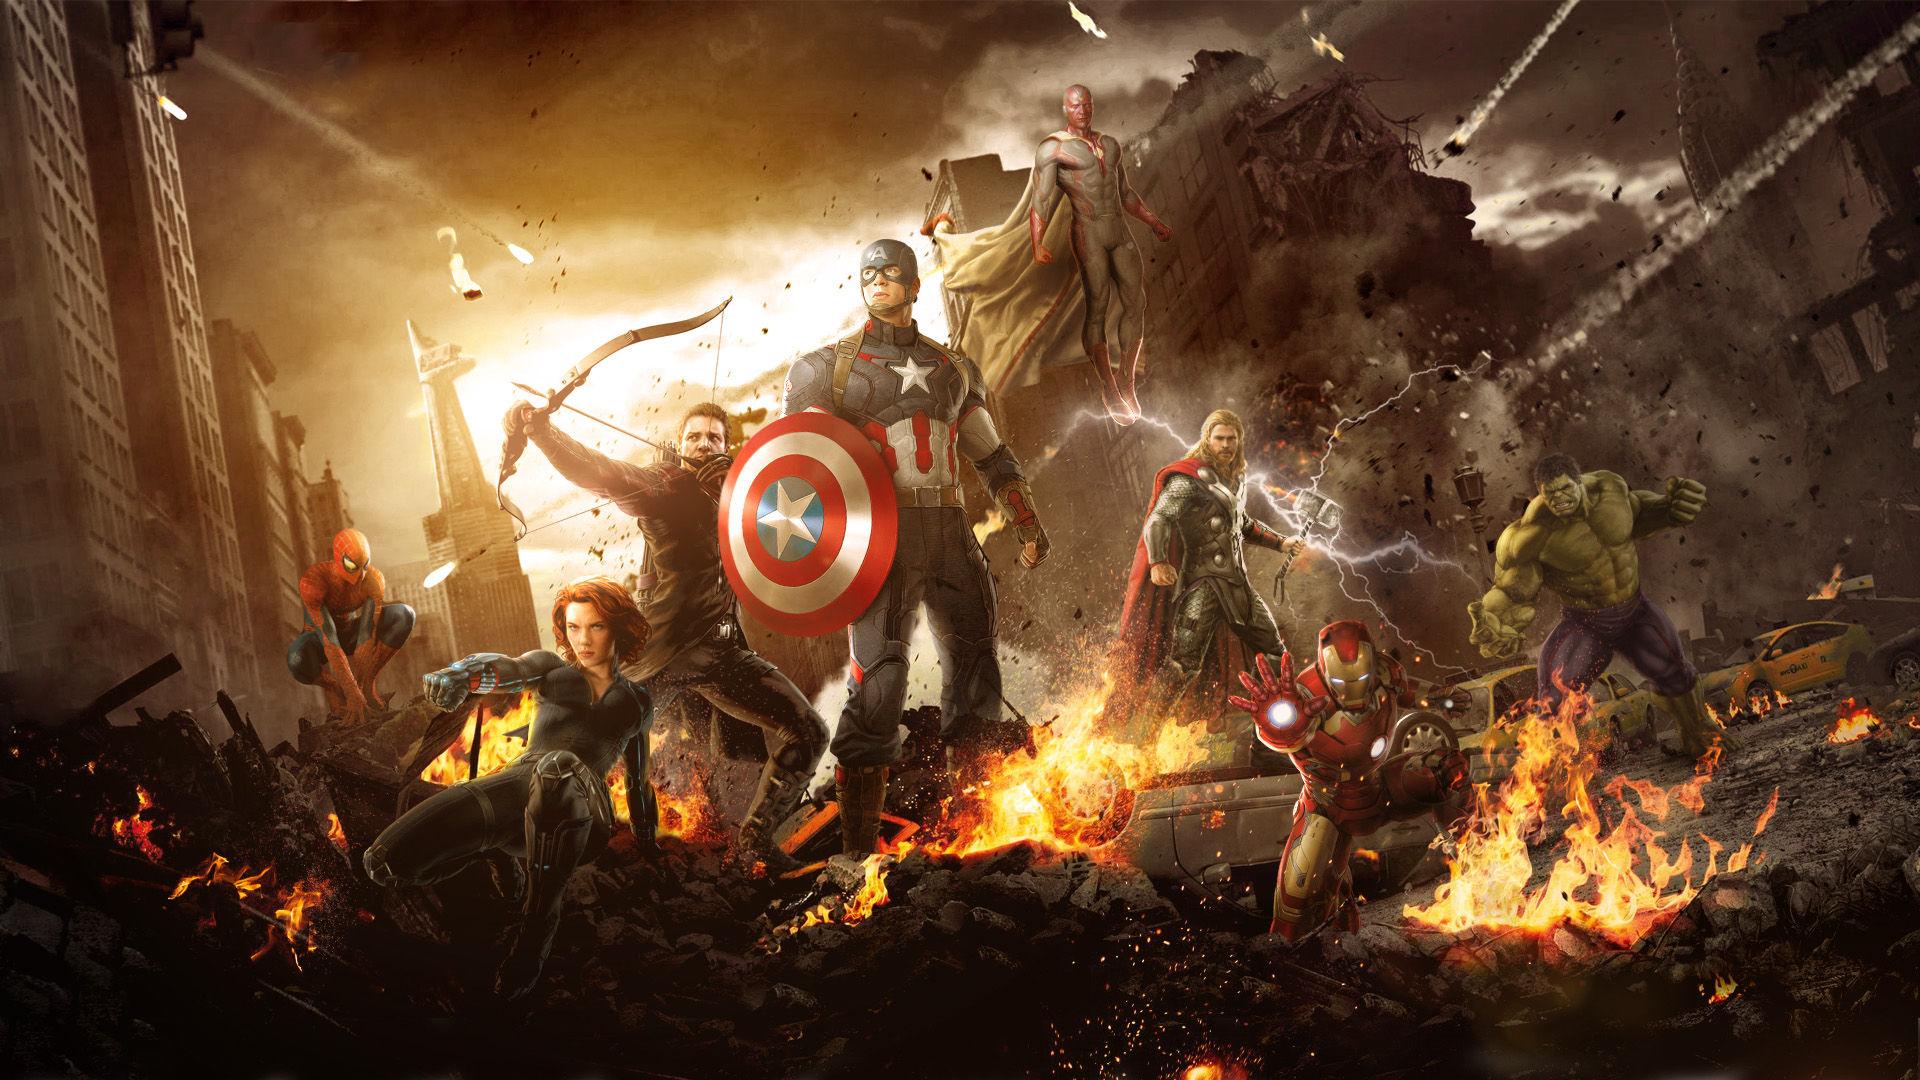 Infinity War Wallpapers on WallpaperSafari